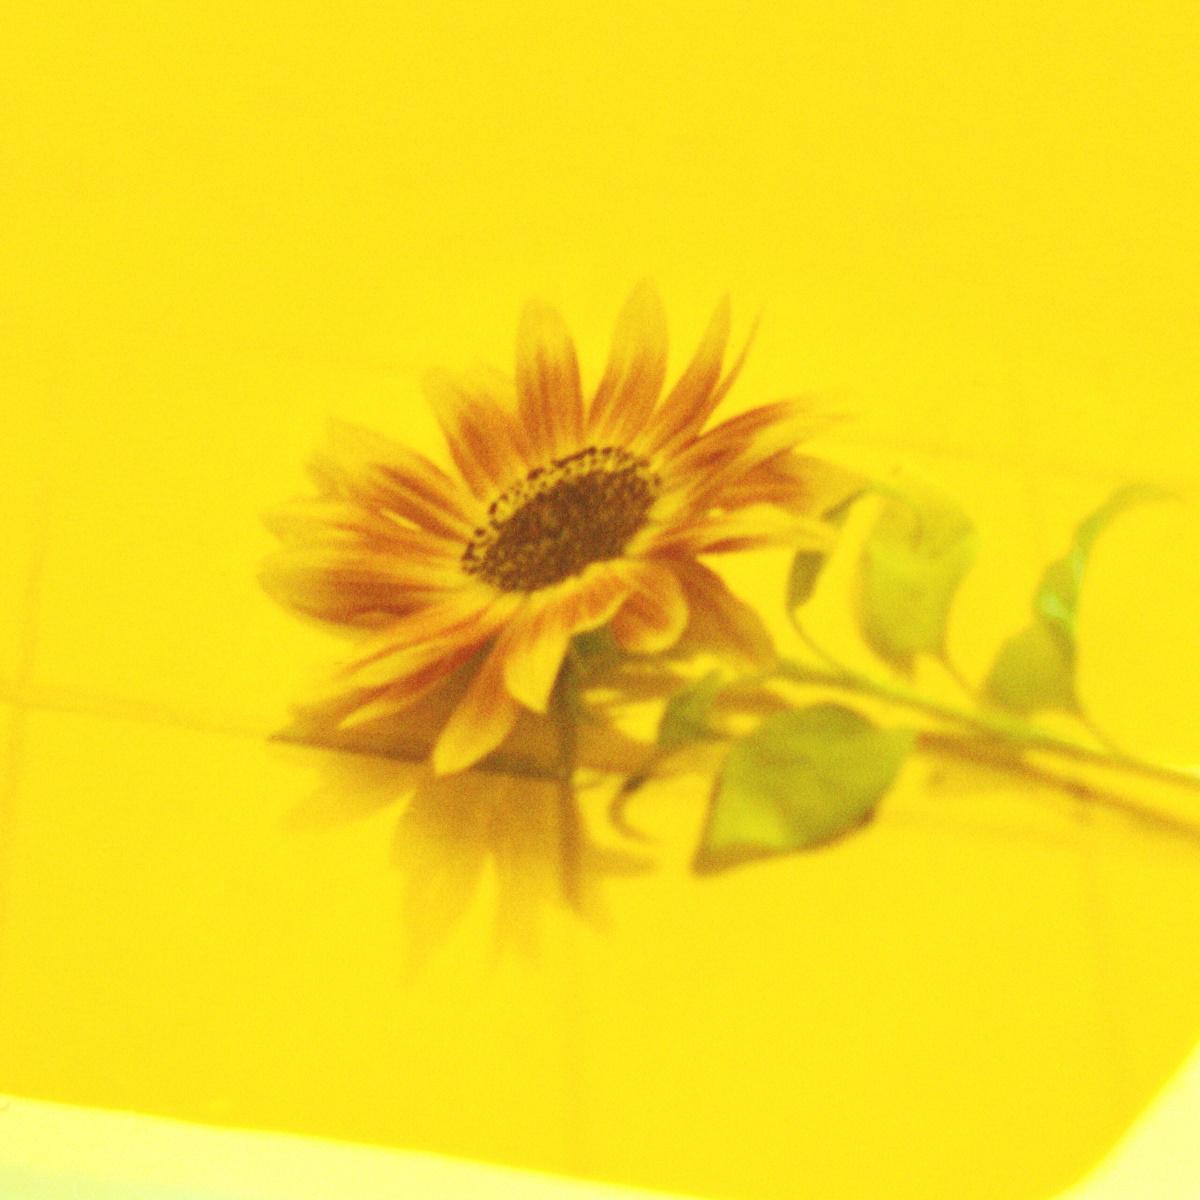 『Vaundy - 花占い』収録の『花占い』ジャケット